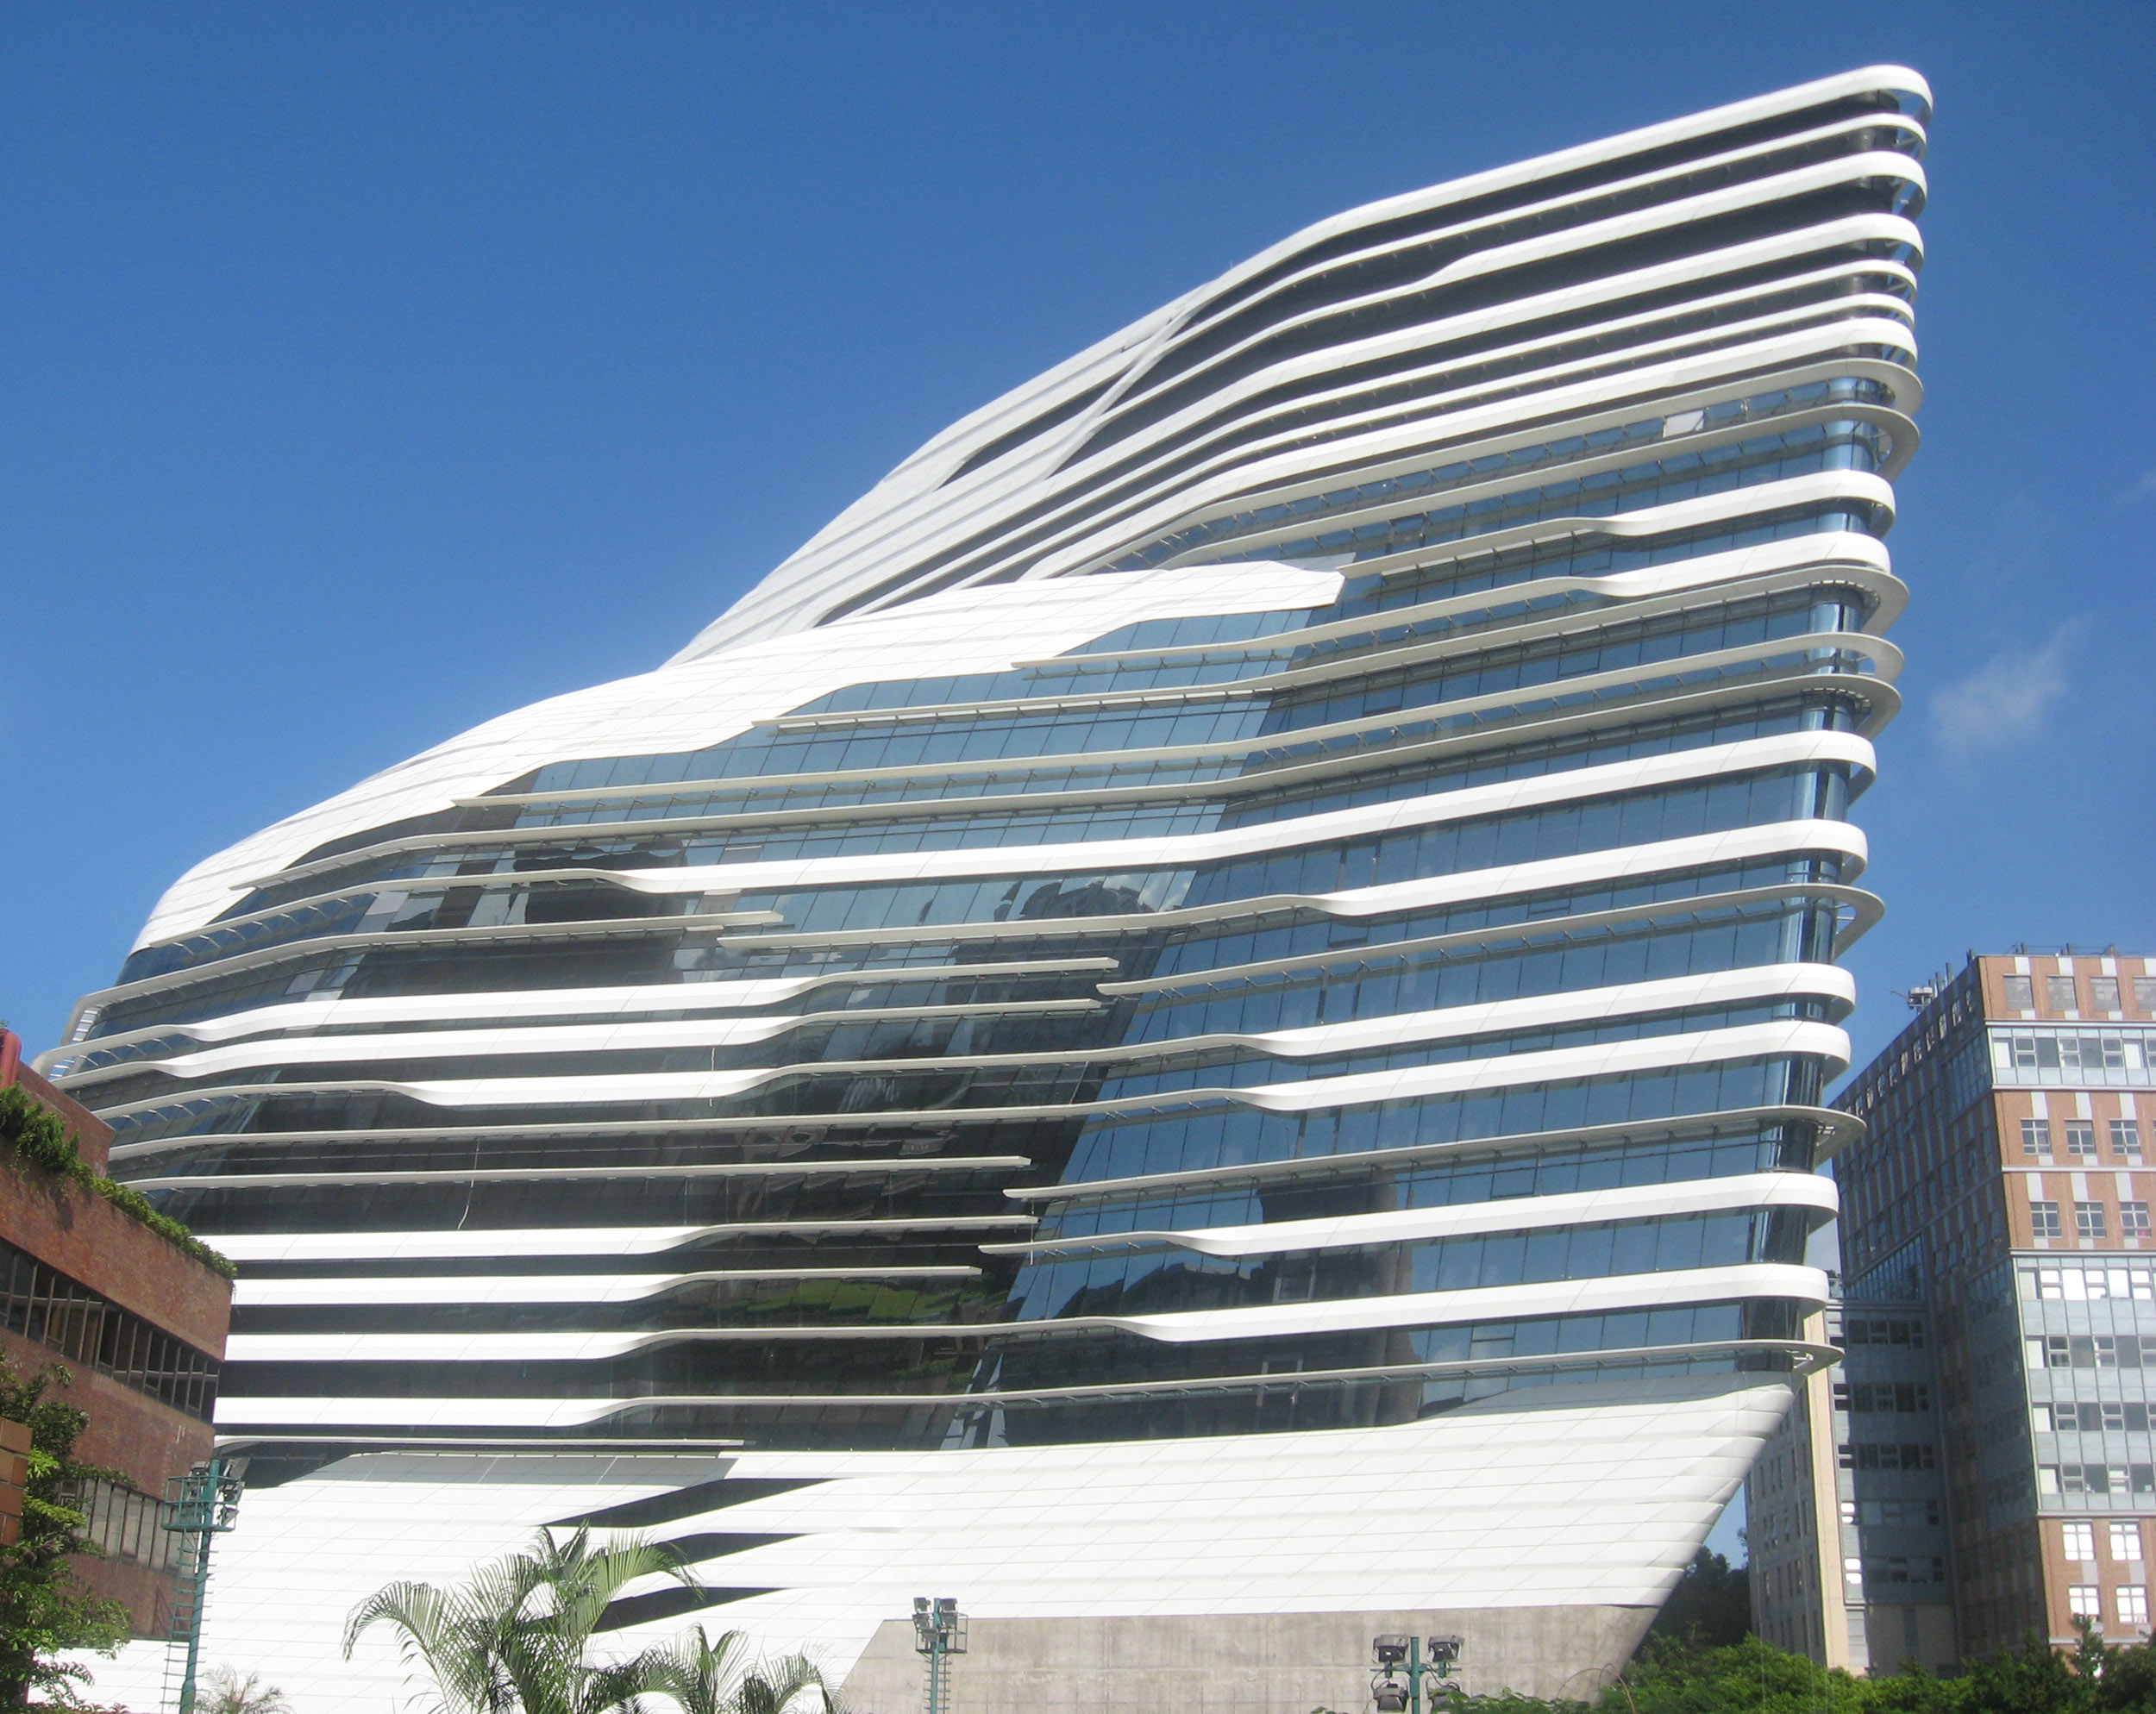 File:Hong Kong Polytechnic University white building.JPG - Wikimedia ...